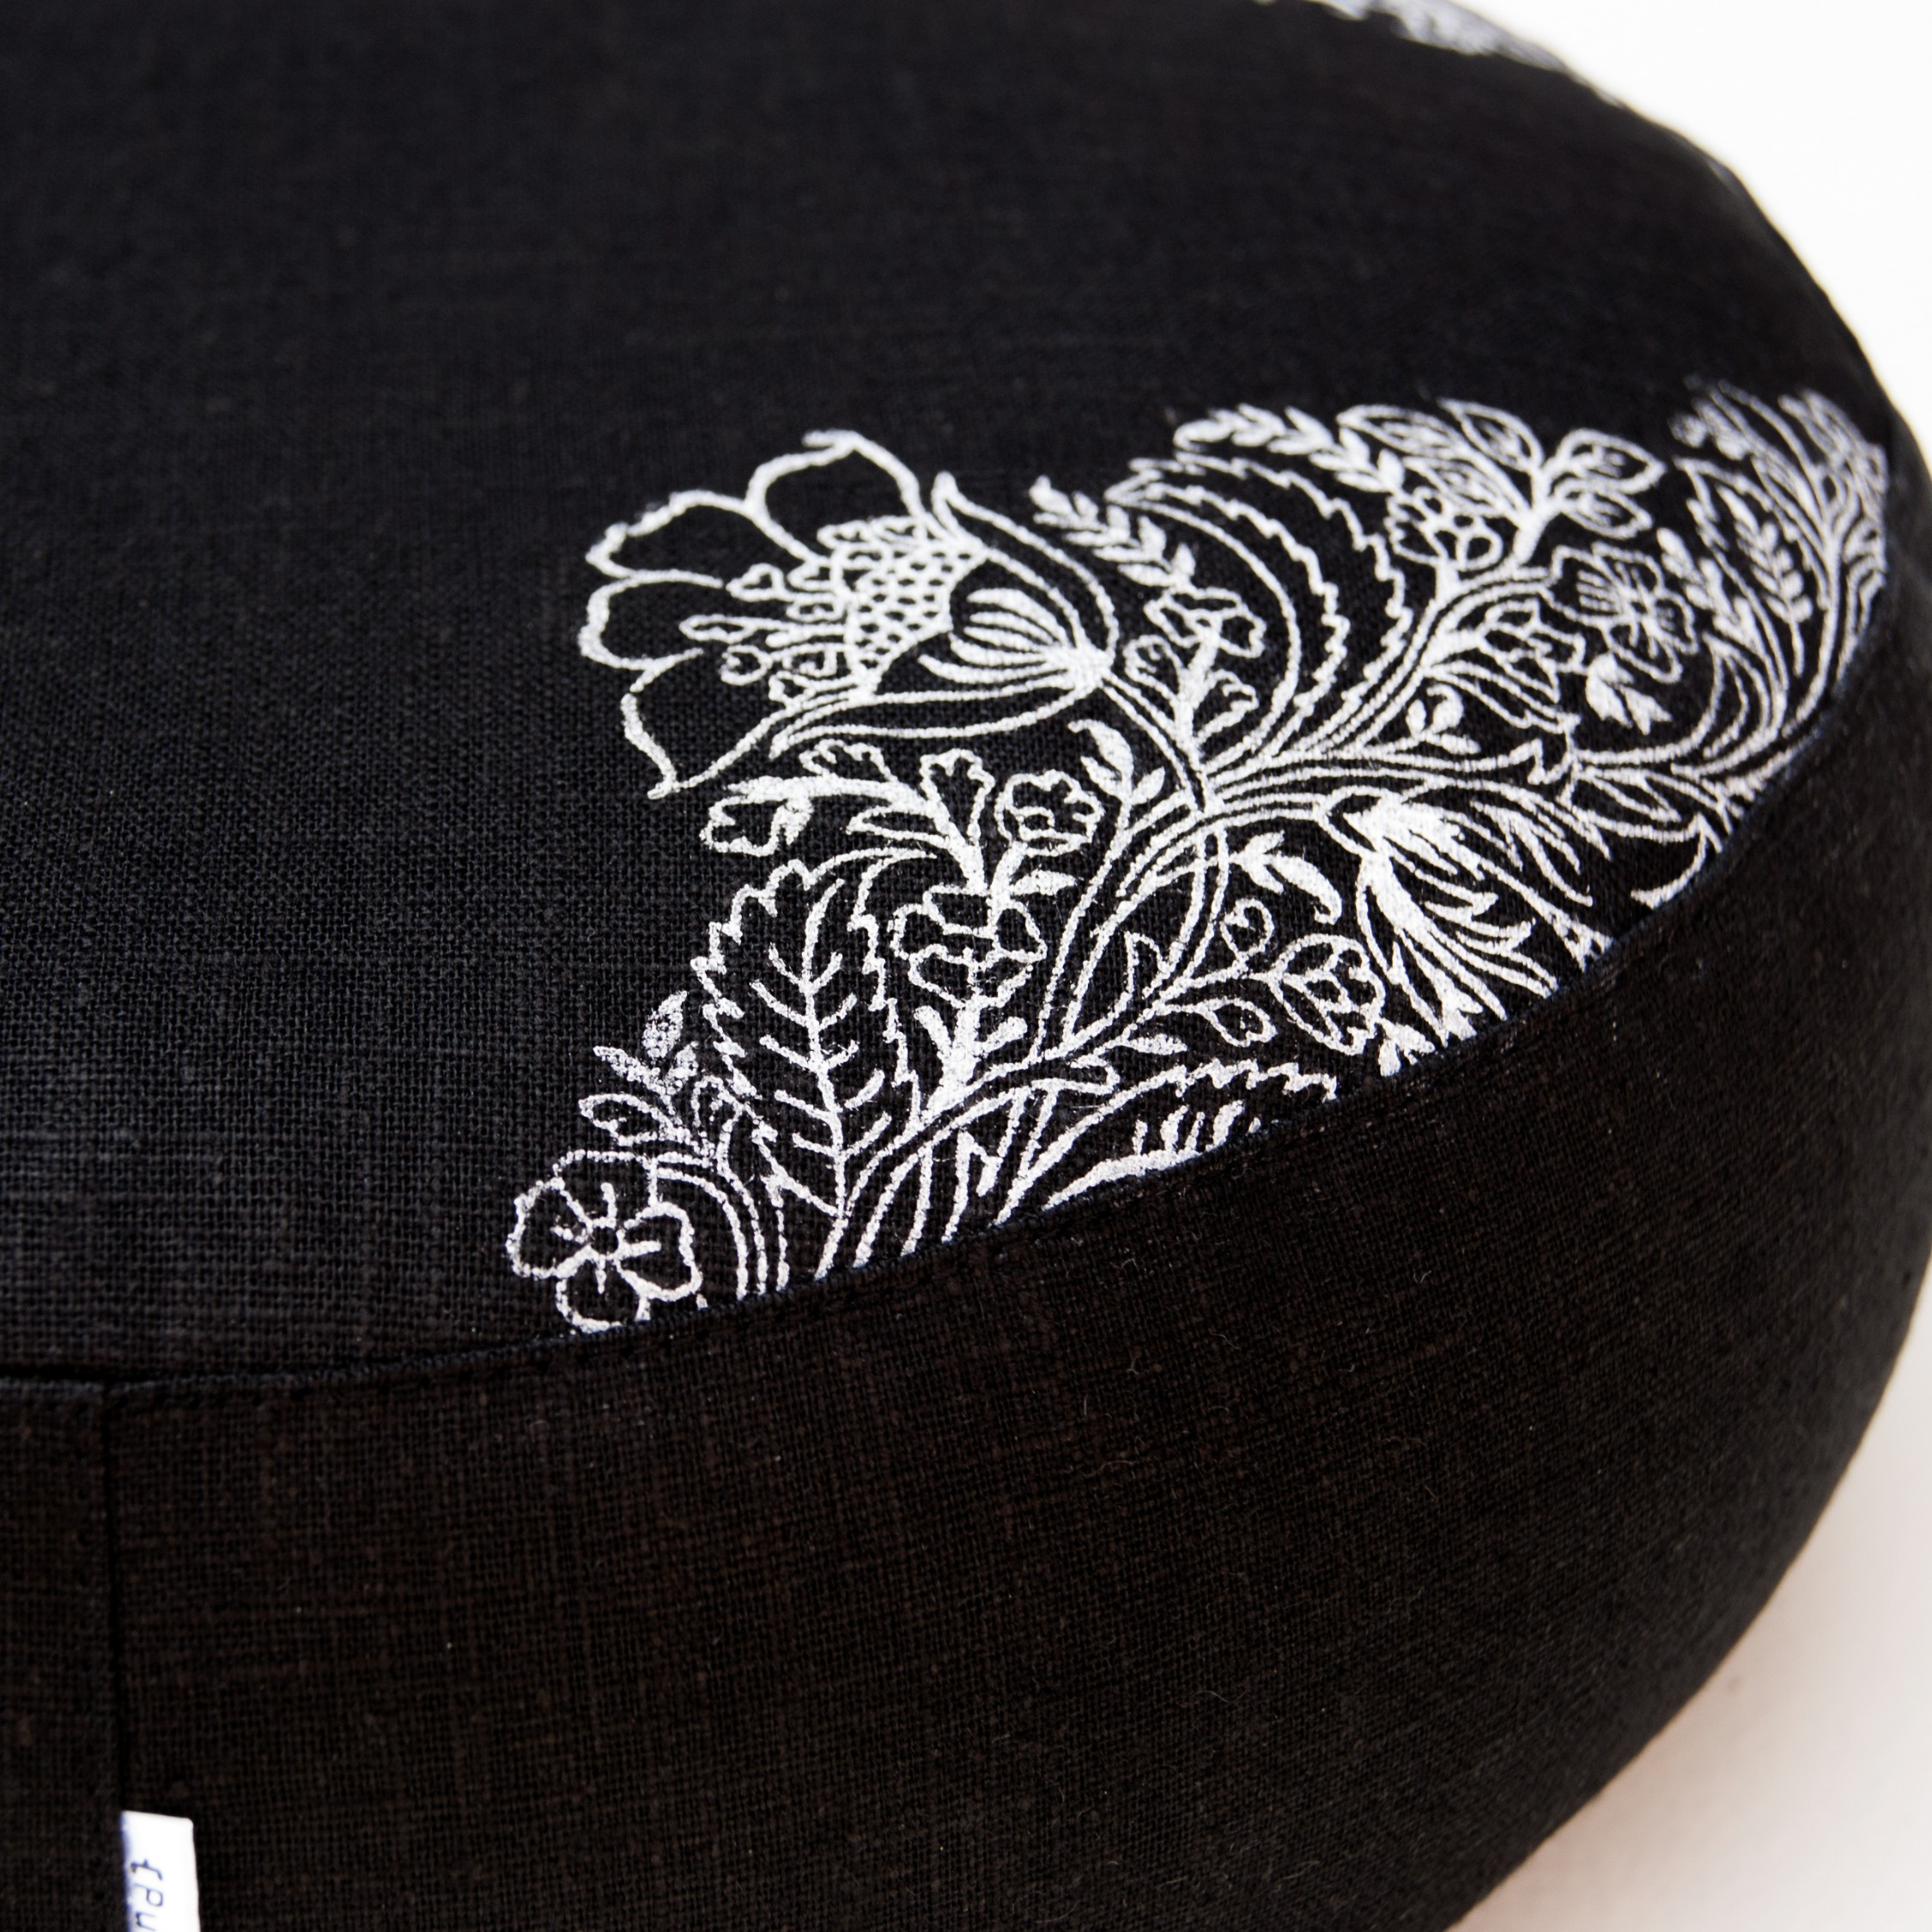 Detailed print on the flax linen meditation cushion